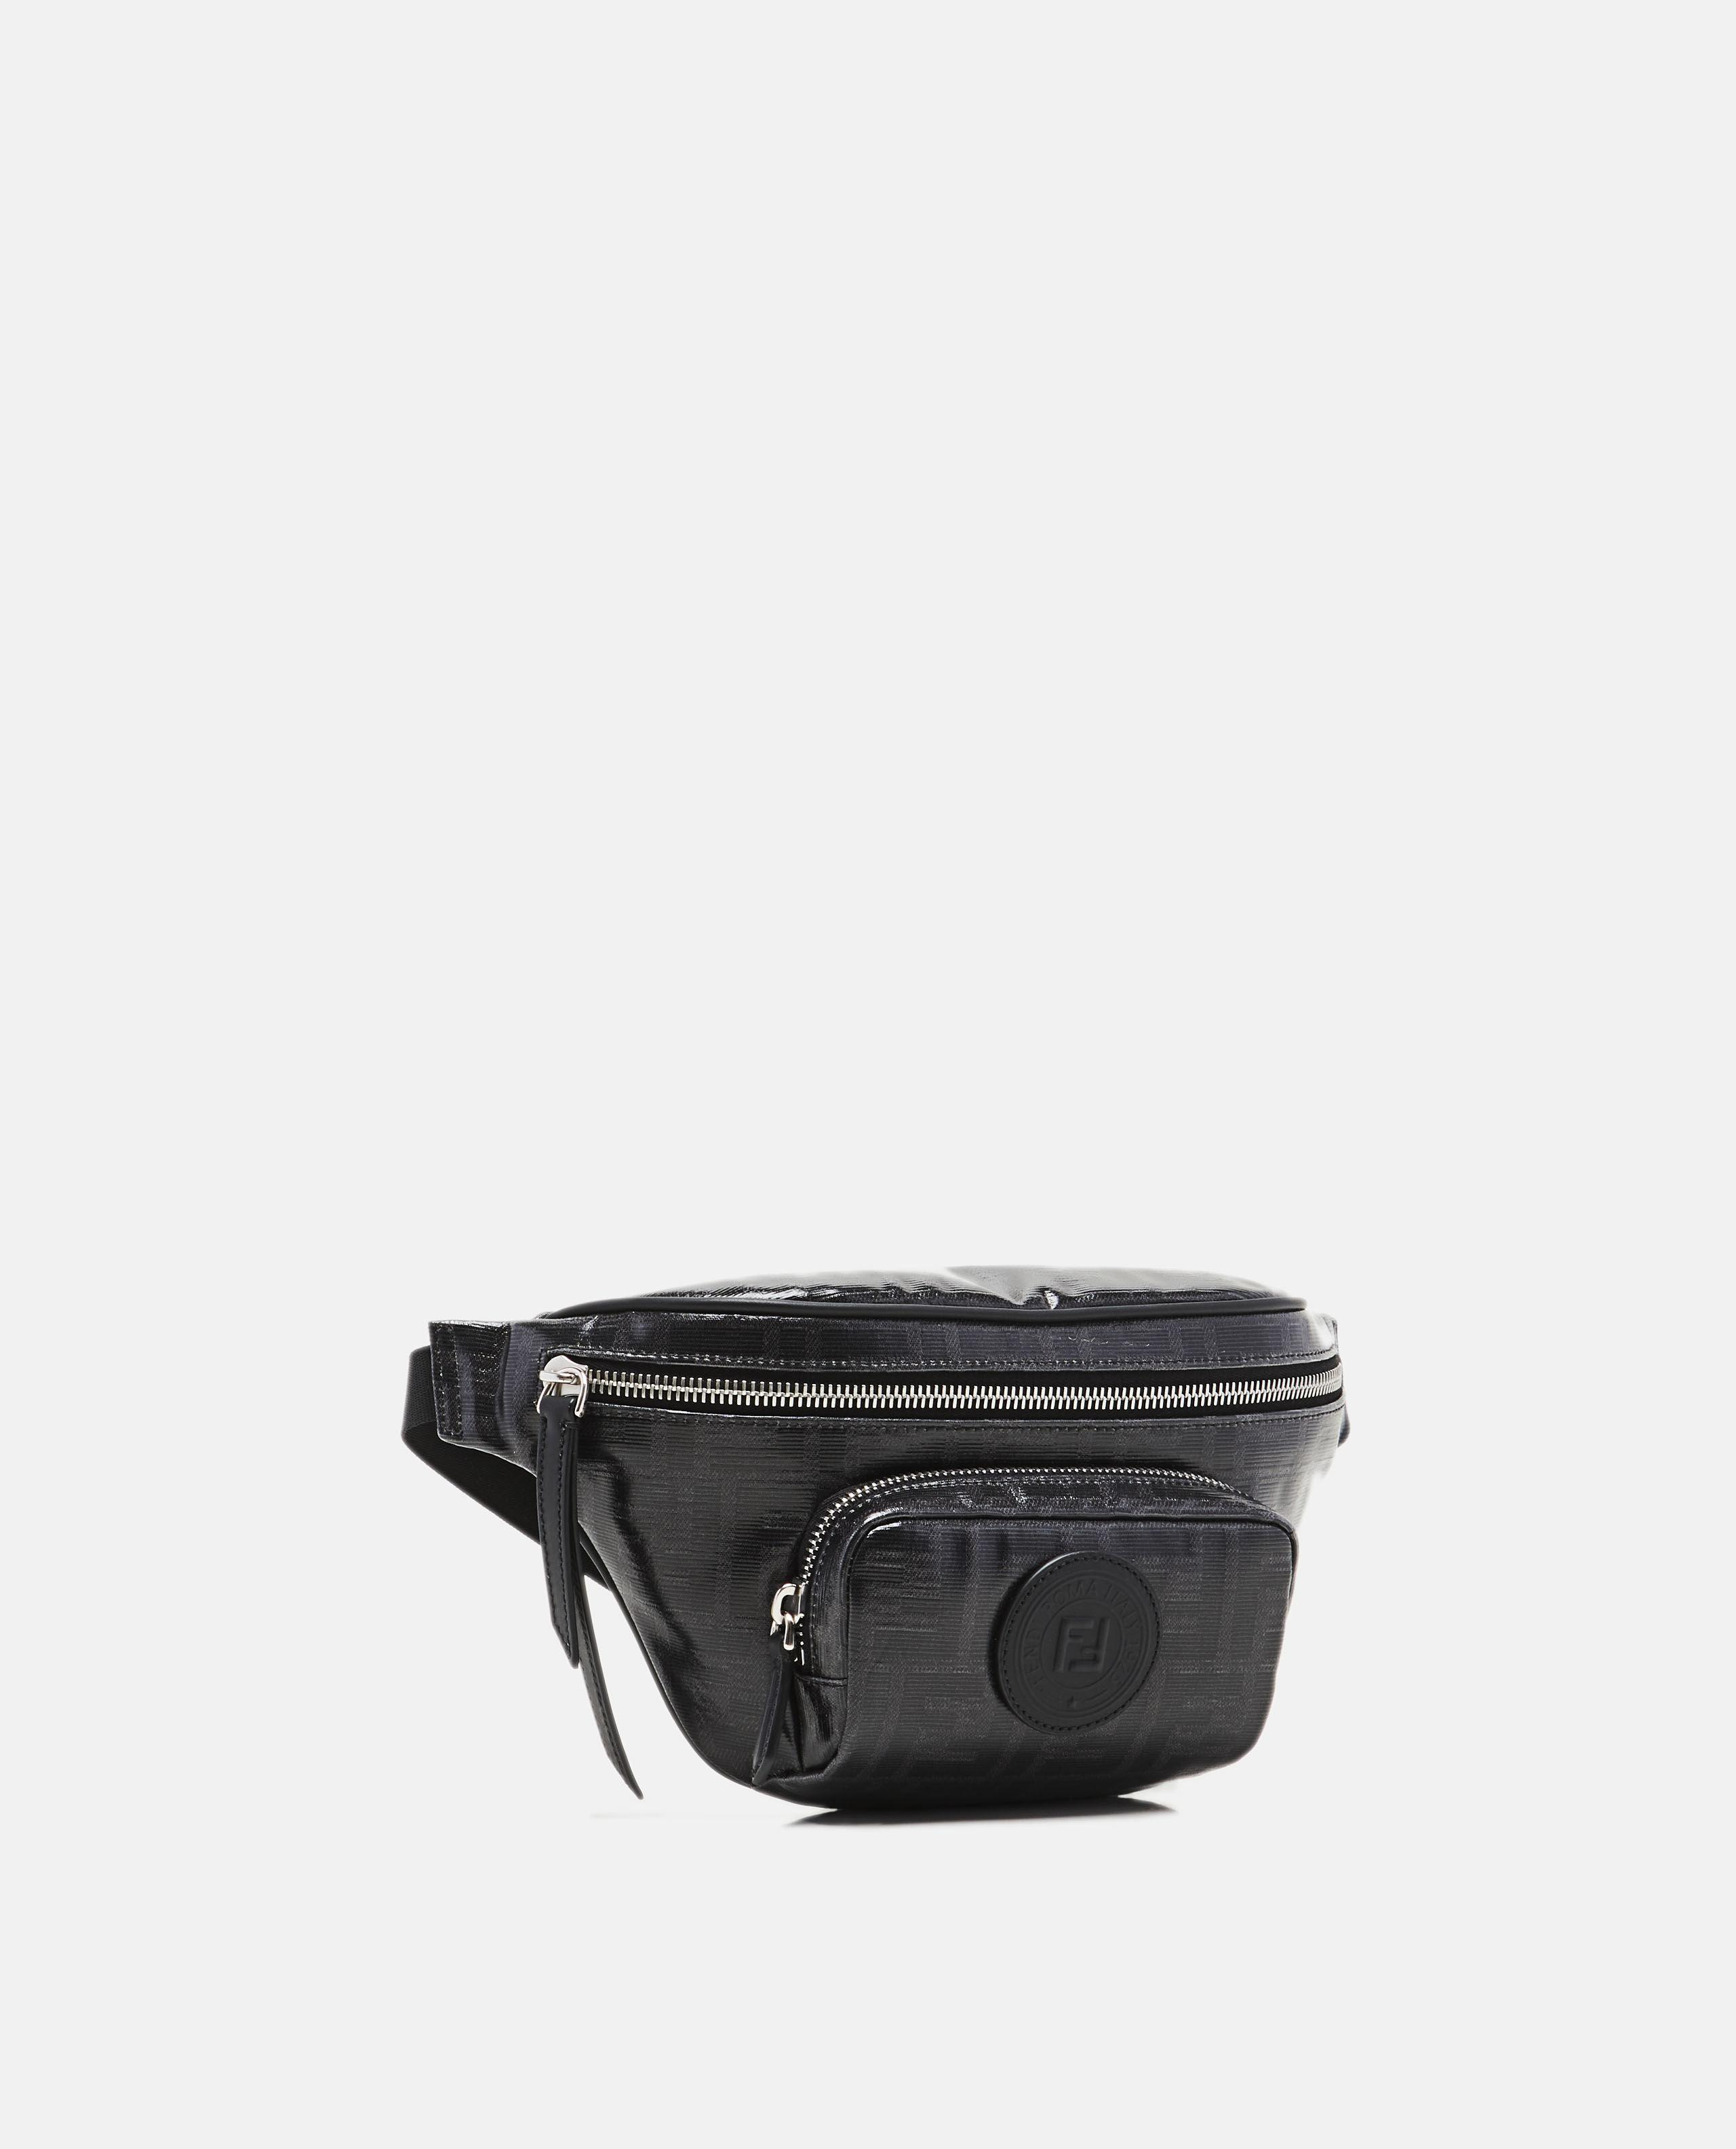 2d6b19781fd4 Fendi Ff Belt Bag in Black for Men - Lyst